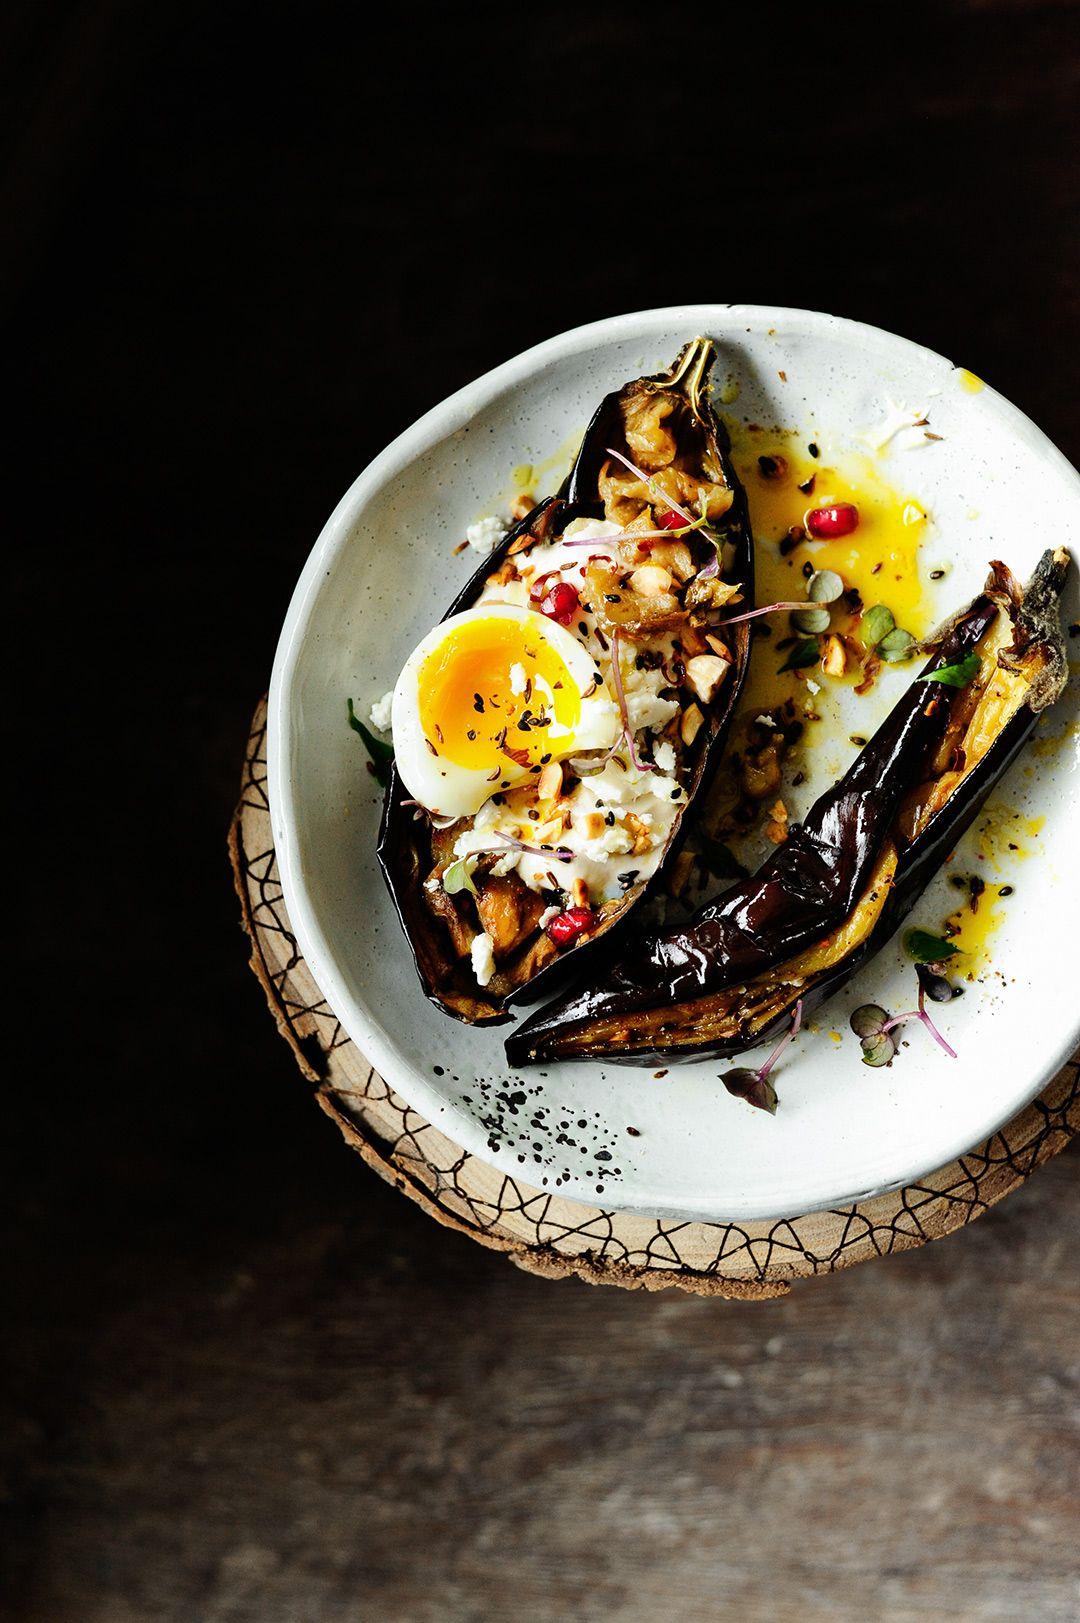 Roasted aubergine with tahini dressing and hazelnuts